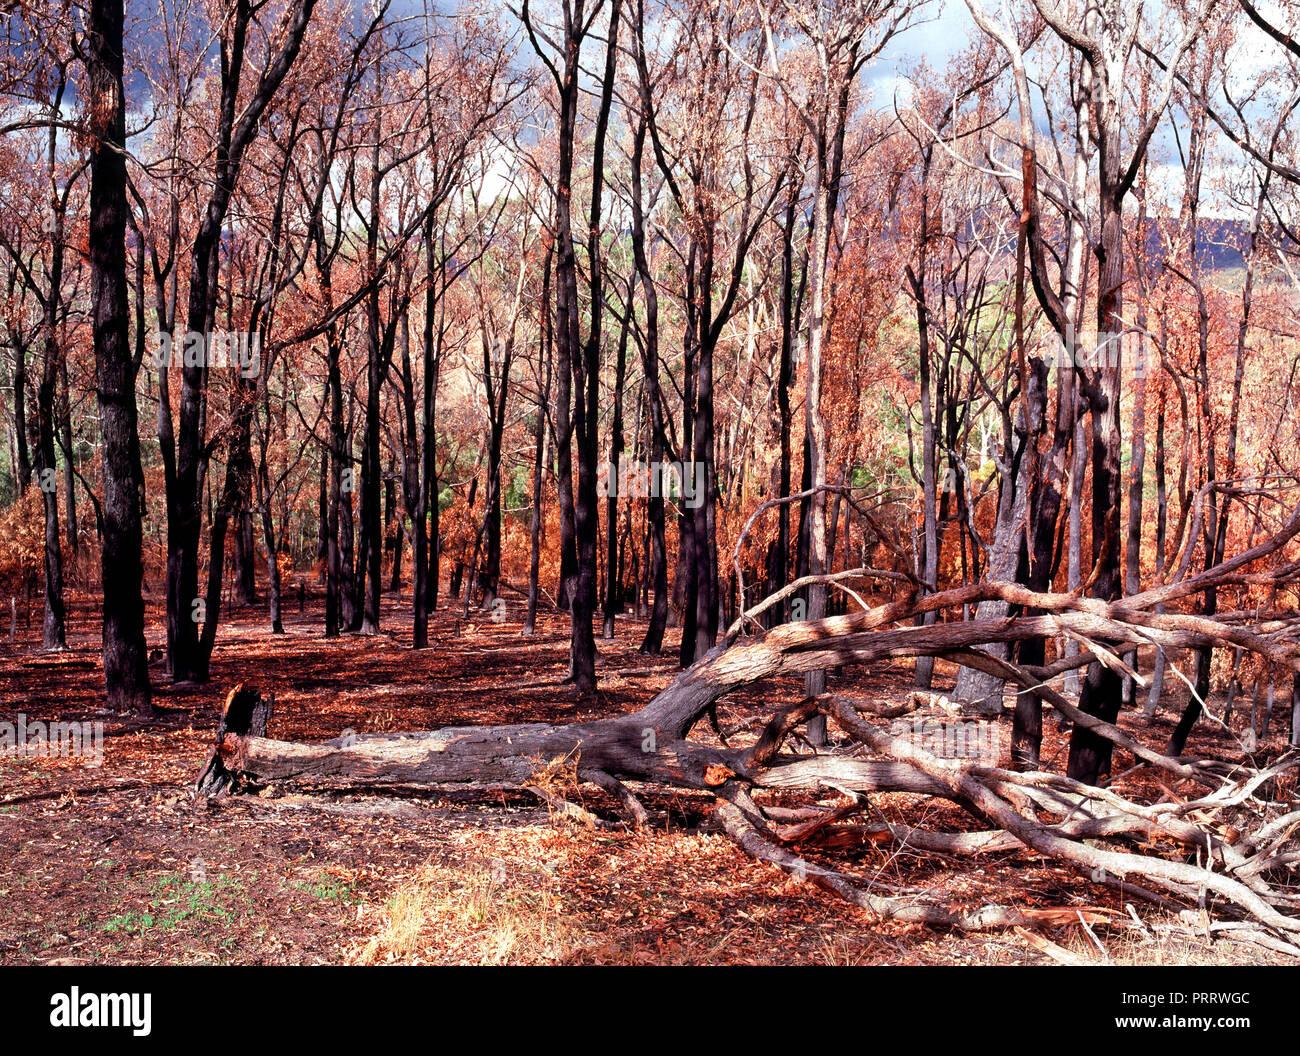 Burnt Trees and  Landscape from the 2009 Black Saturday Bushfires, Victoria Australia - Stock Image